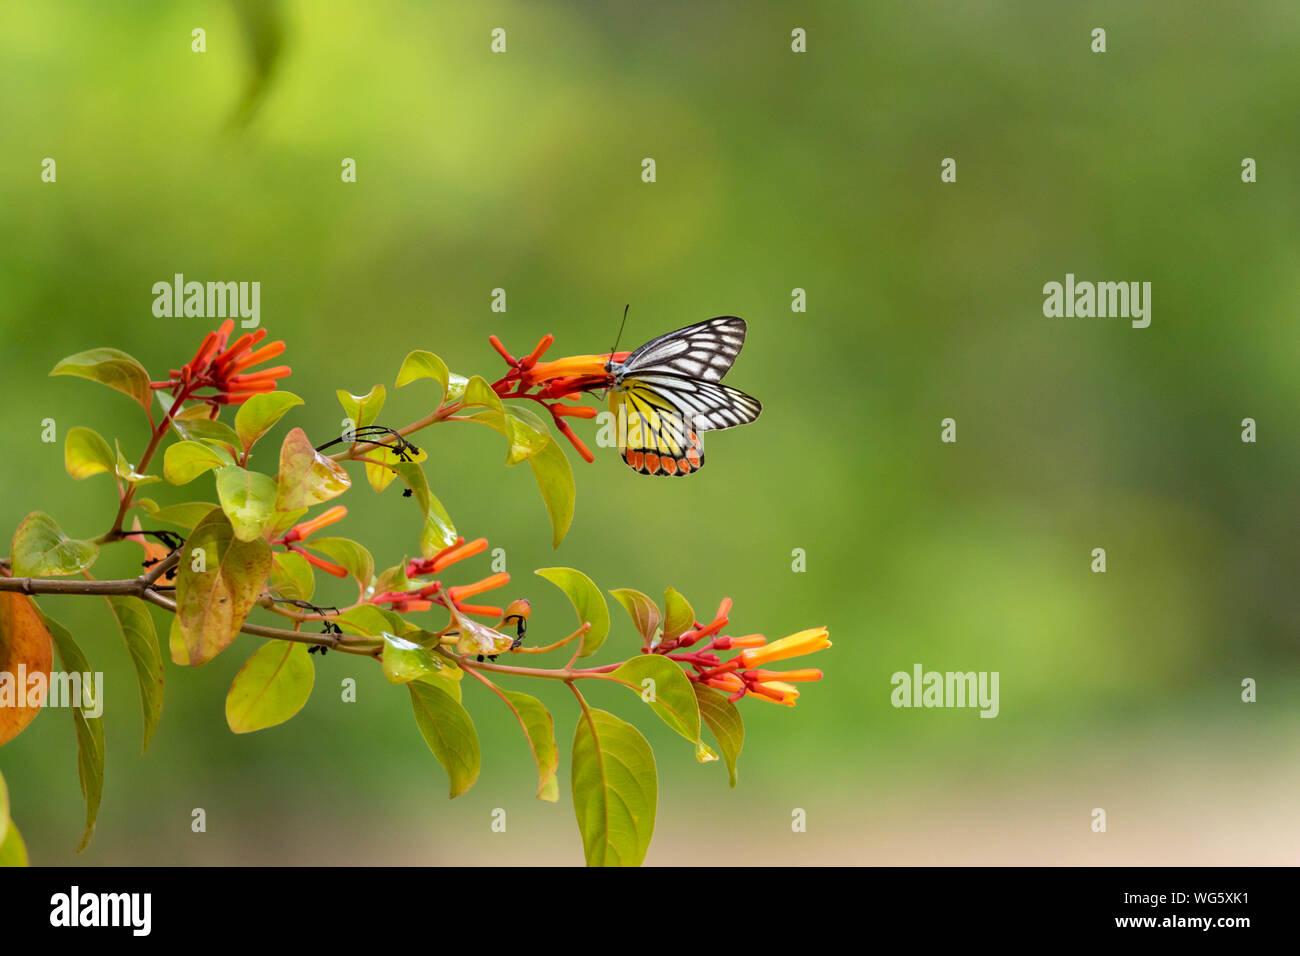 Wonderful Butterfly on a Flower Stock Photo